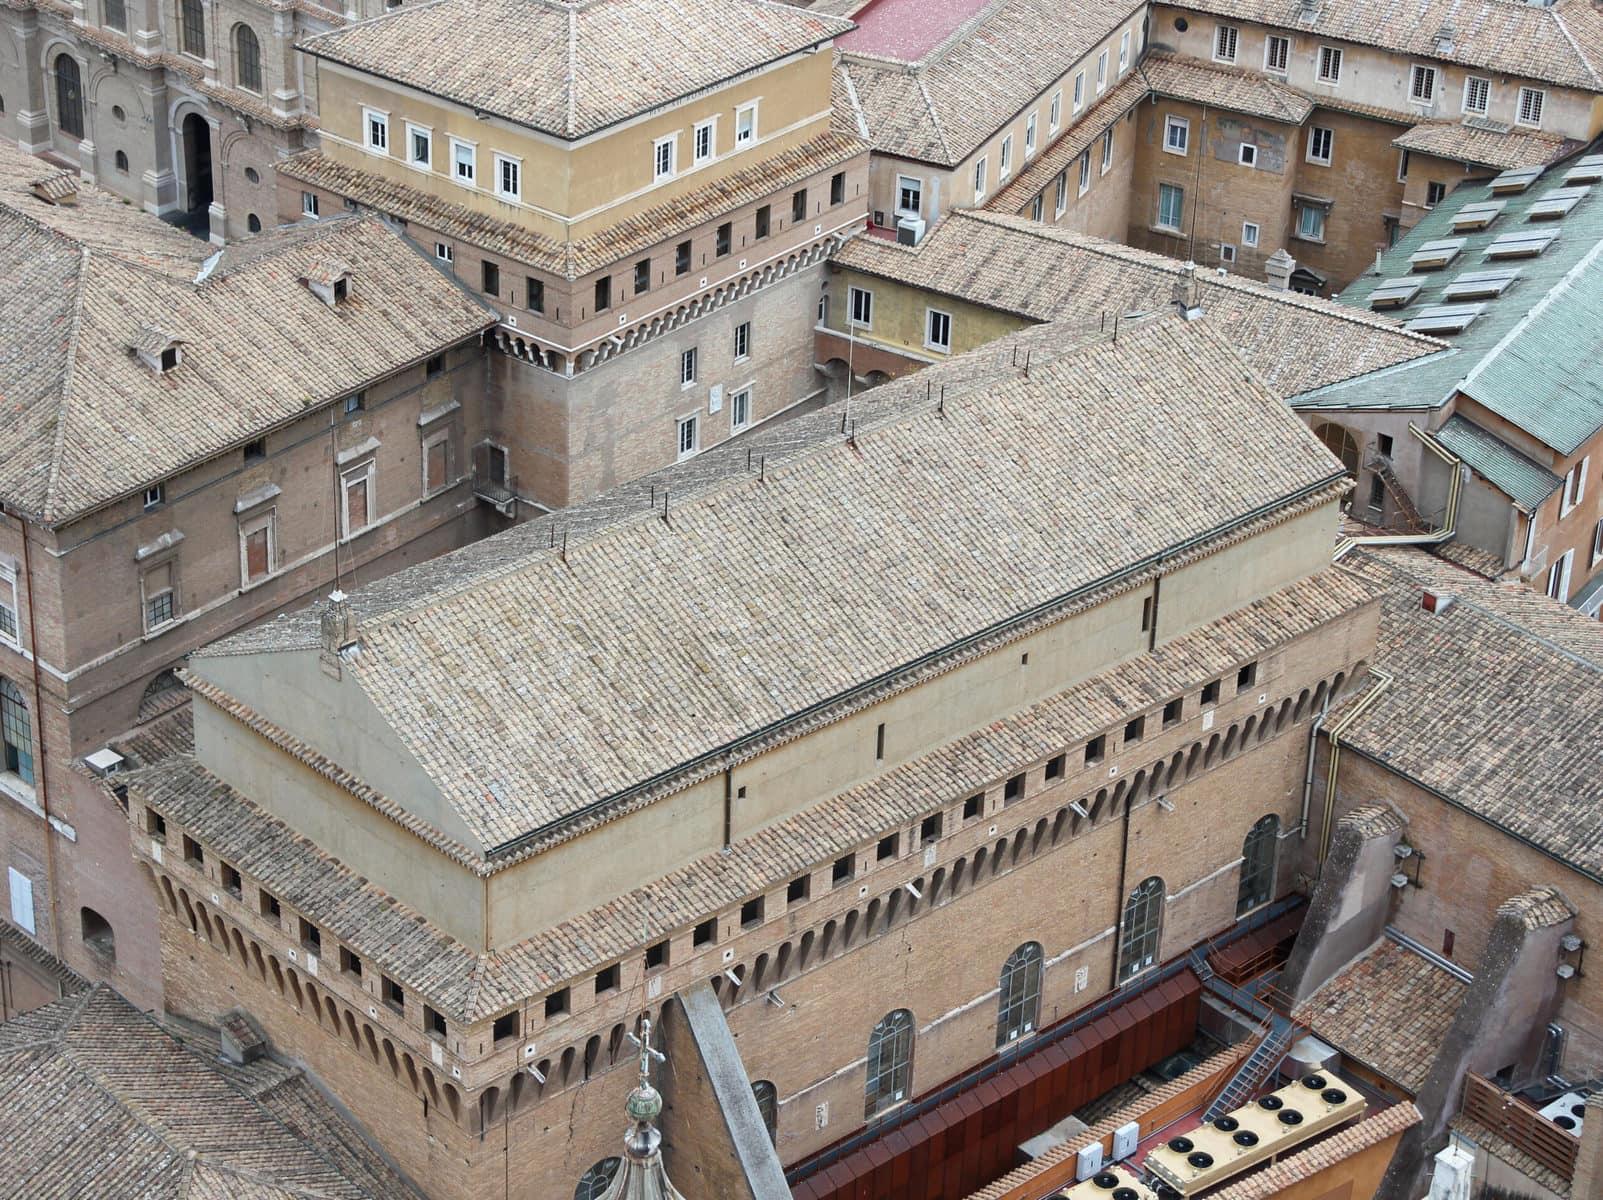 Sixtinische Kapelle, Vatikanische Museen, Rom